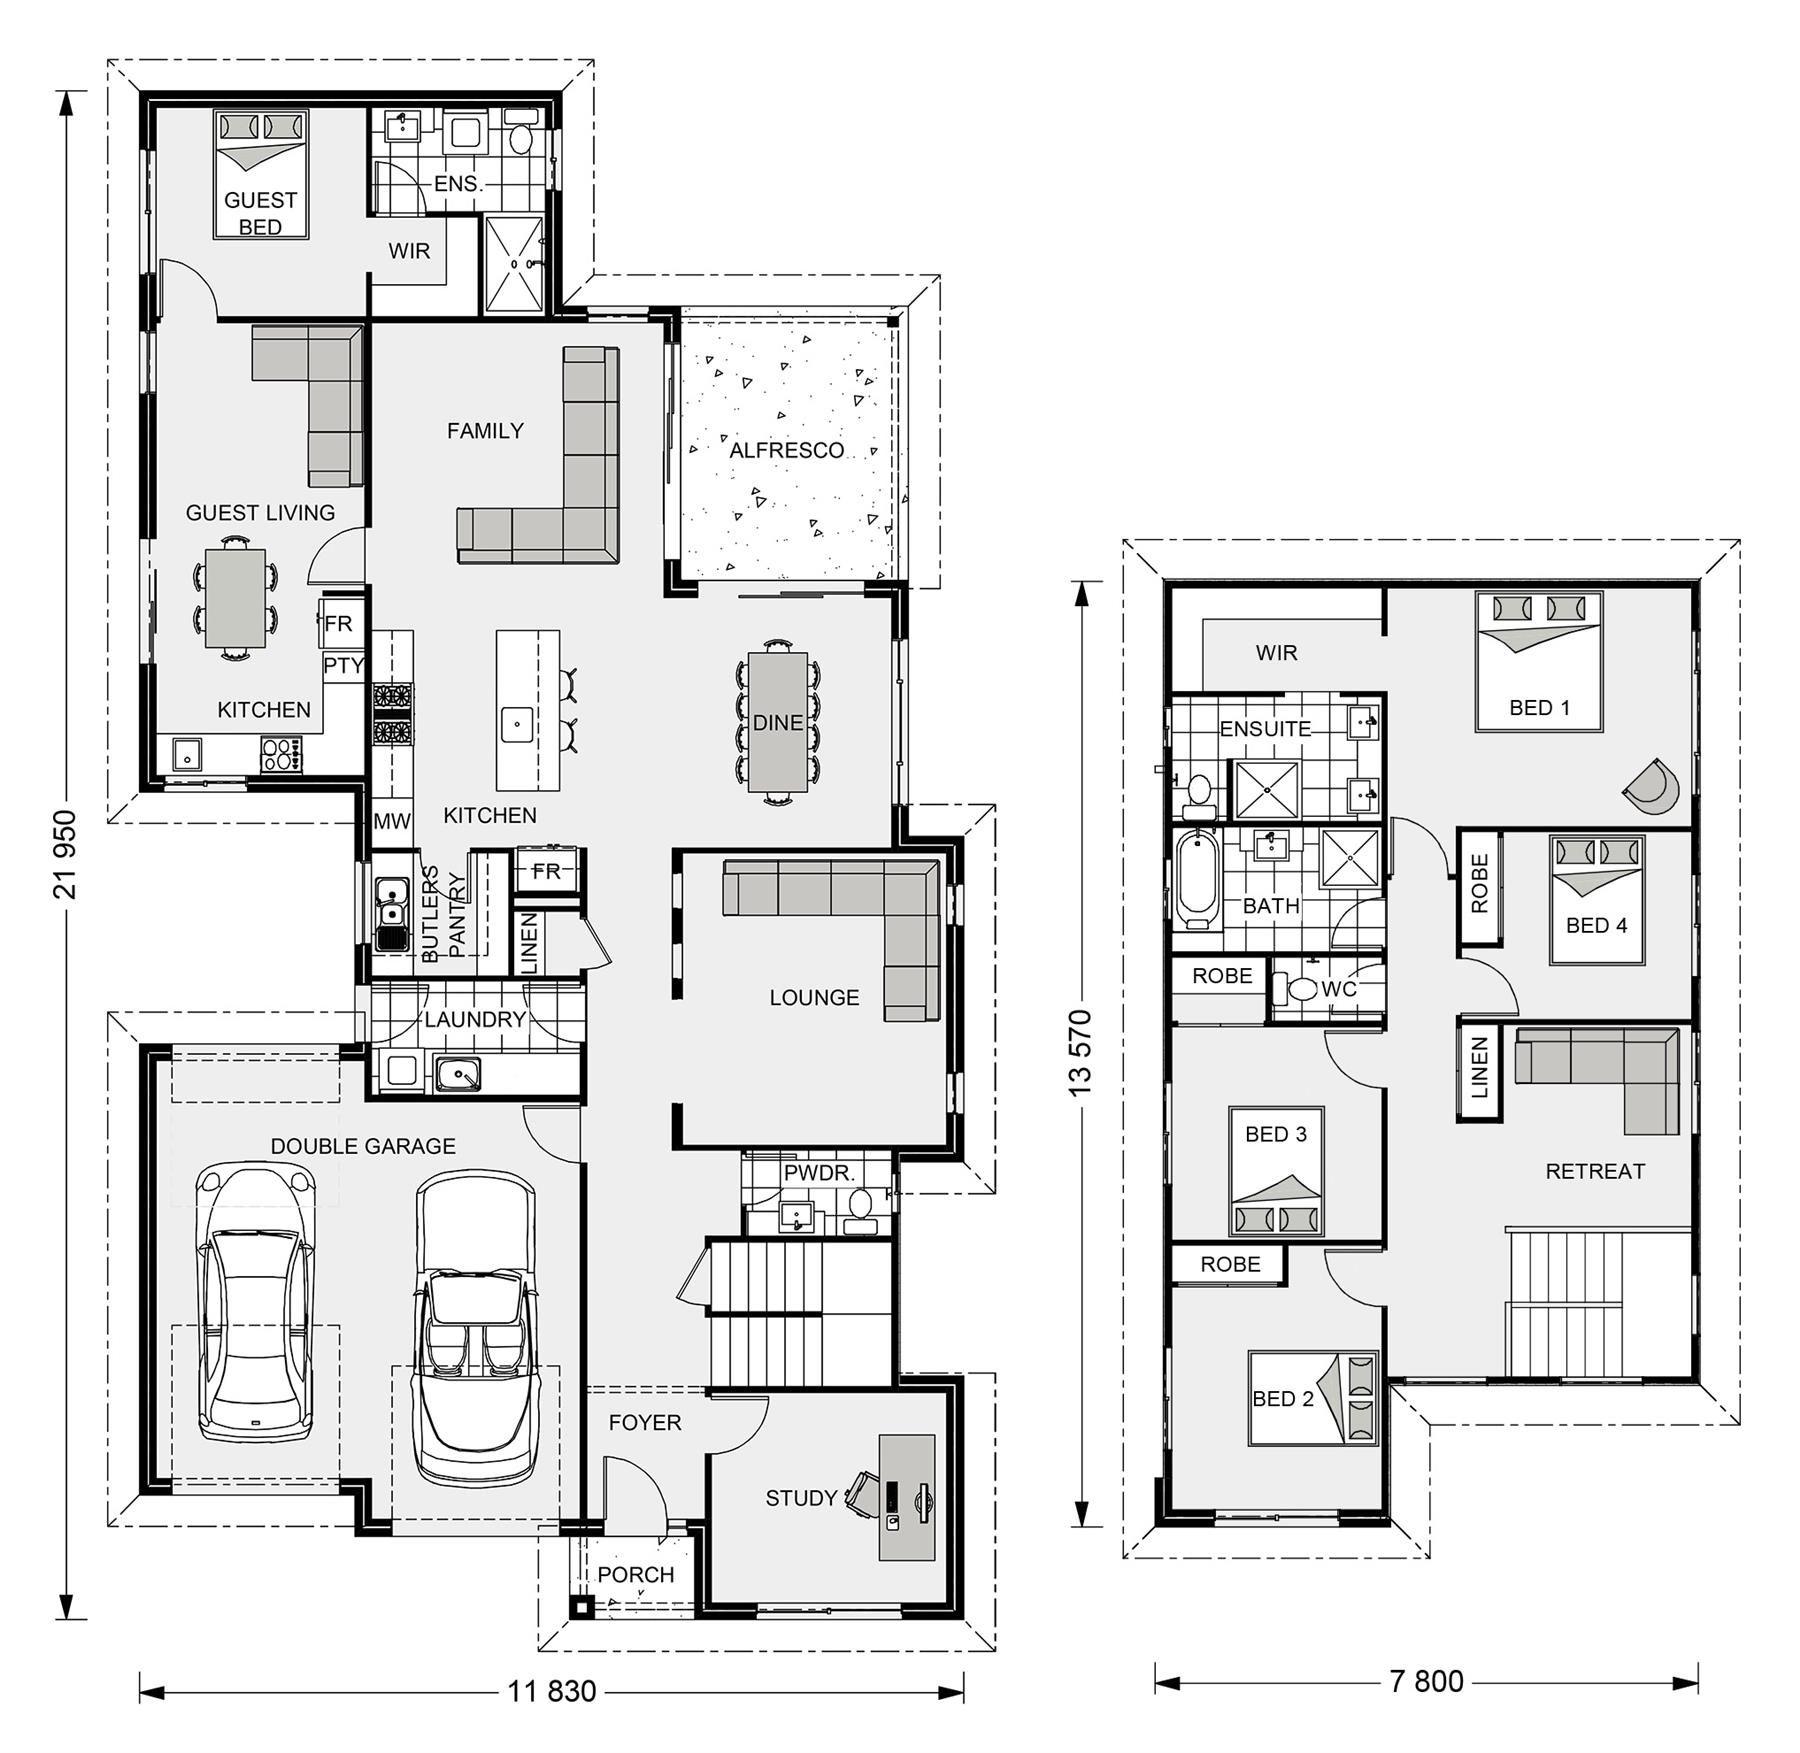 Kensington 270 With Granny Flat Design Ideas Home Designs In Newcastle G J Gardner Homes House Design Multigenerational House Plans Floor Plan Design